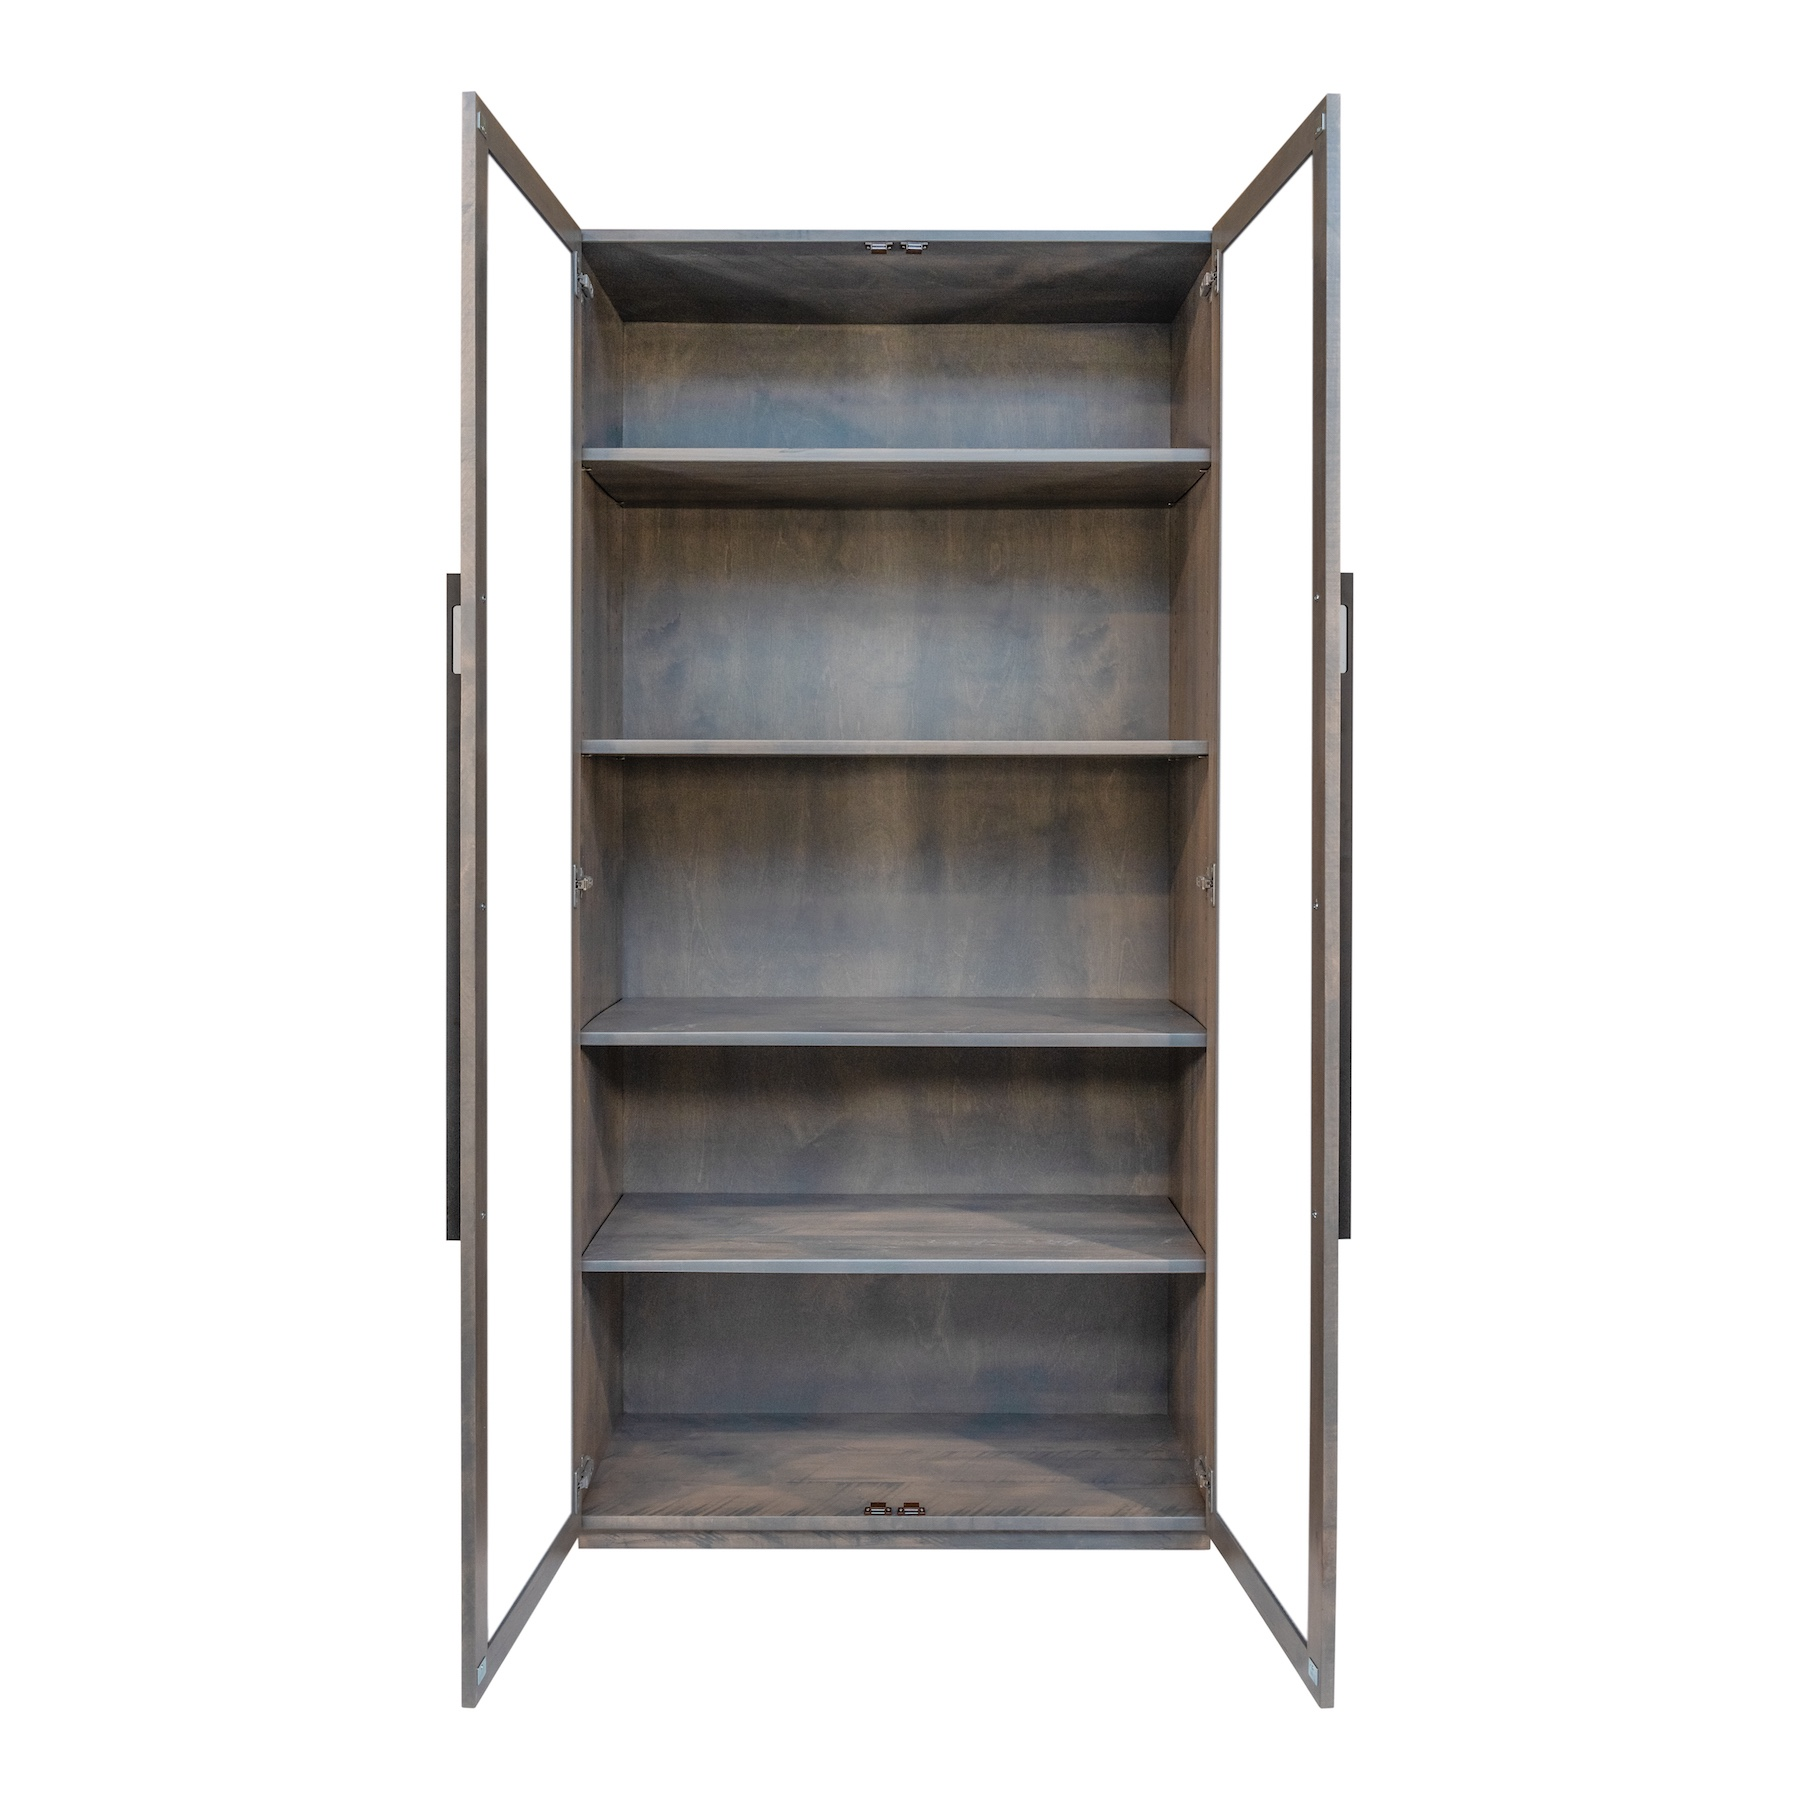 Woodcraft_Furniture_PhoenixBookcase-3-1.jpg